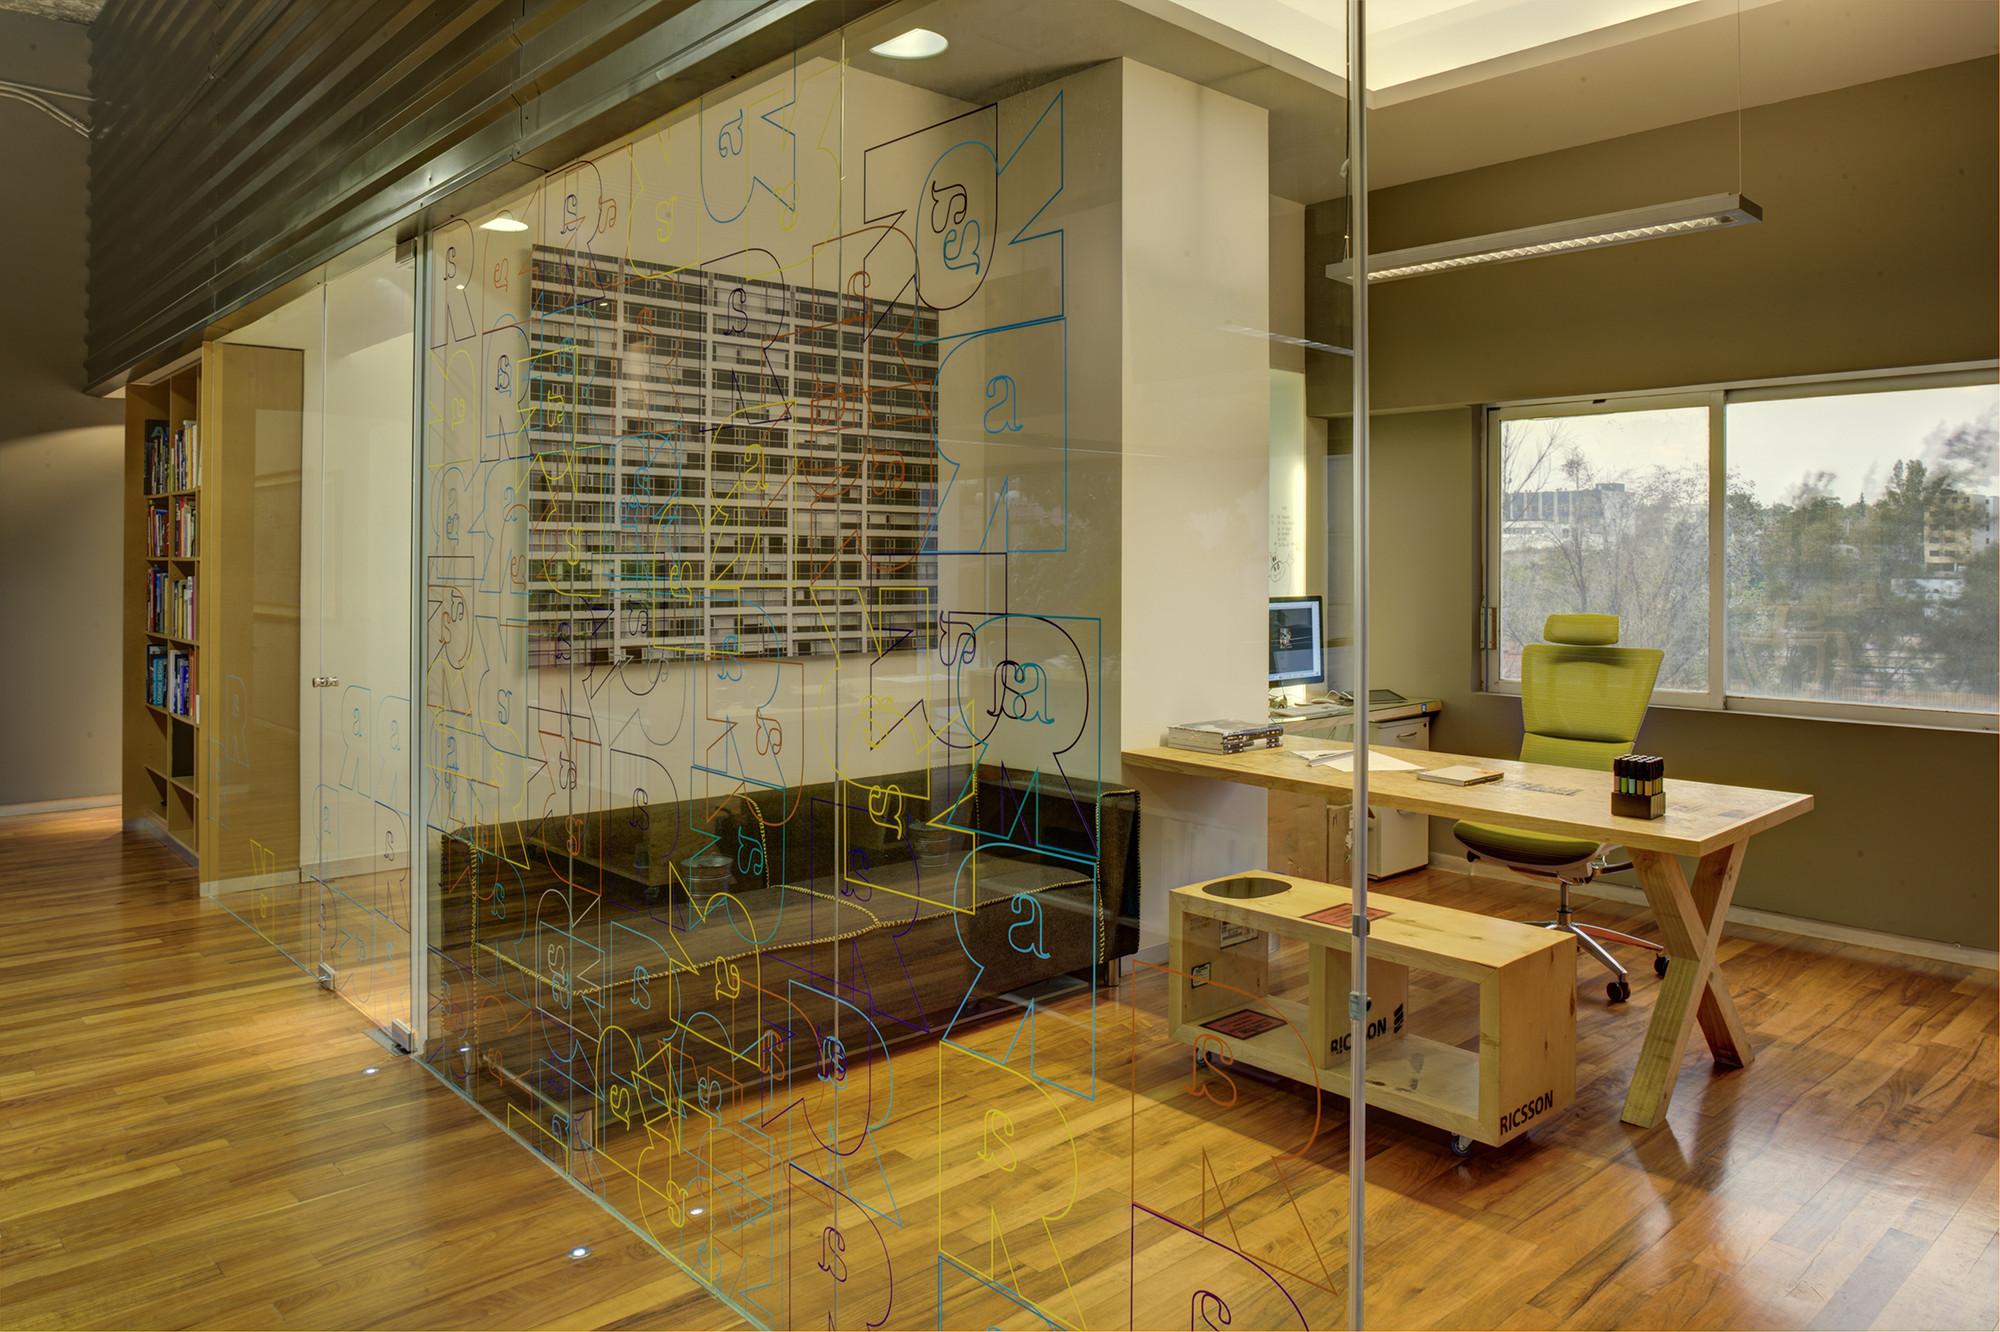 Galer a de oficinas rima rima 2 - Oficinas de arquitectura ...